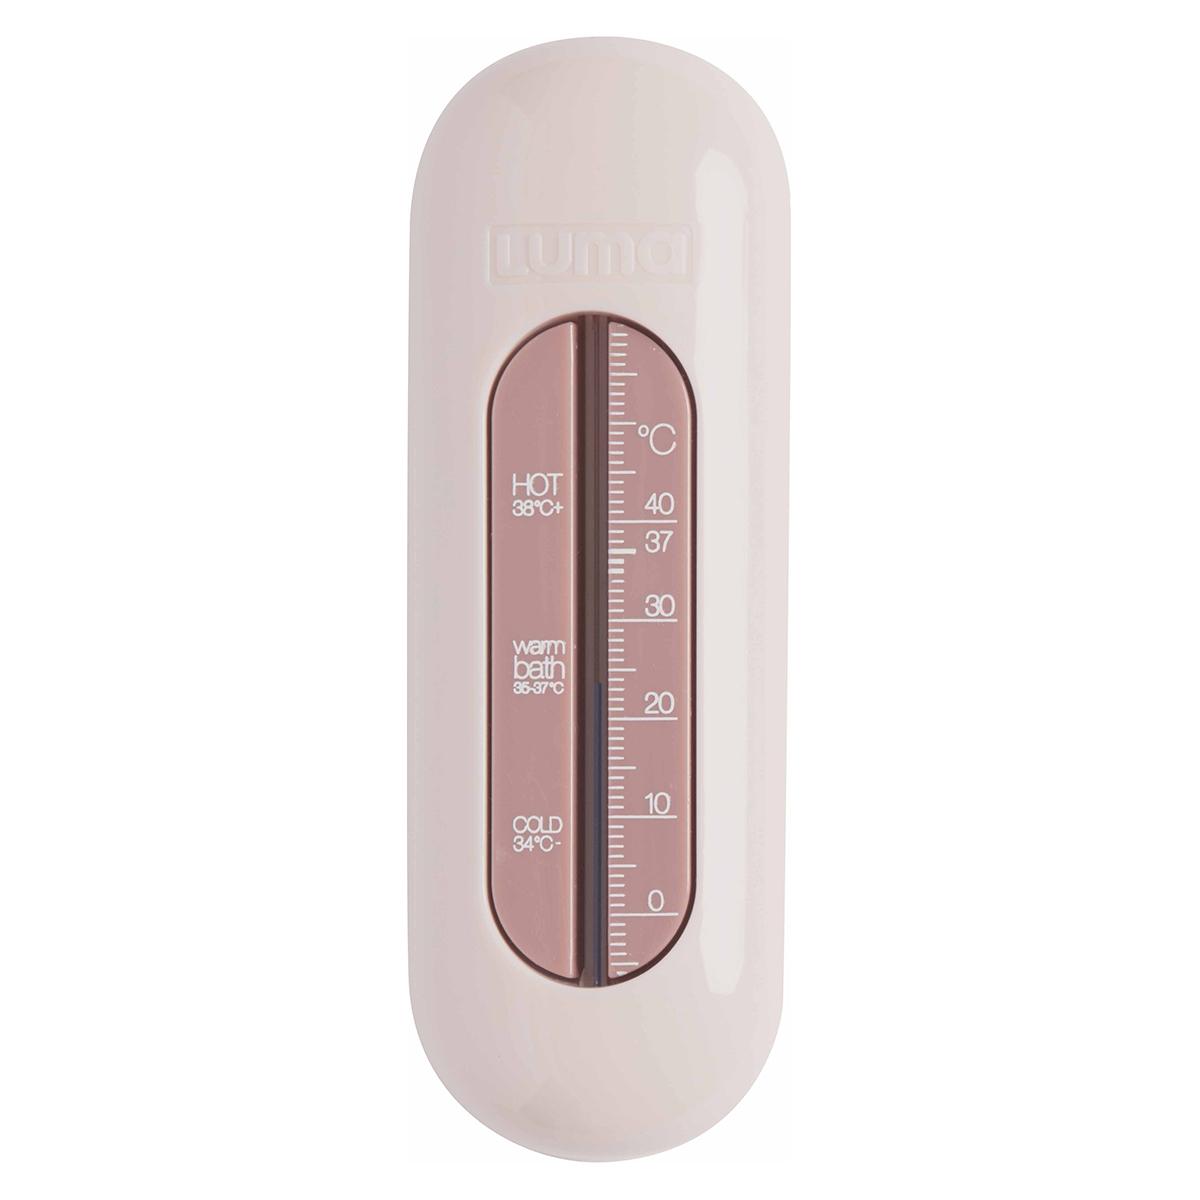 Thermomètre de bain Thermomètre de Bain - Rose Blossom Thermomètre de Bain - Rose Blossom